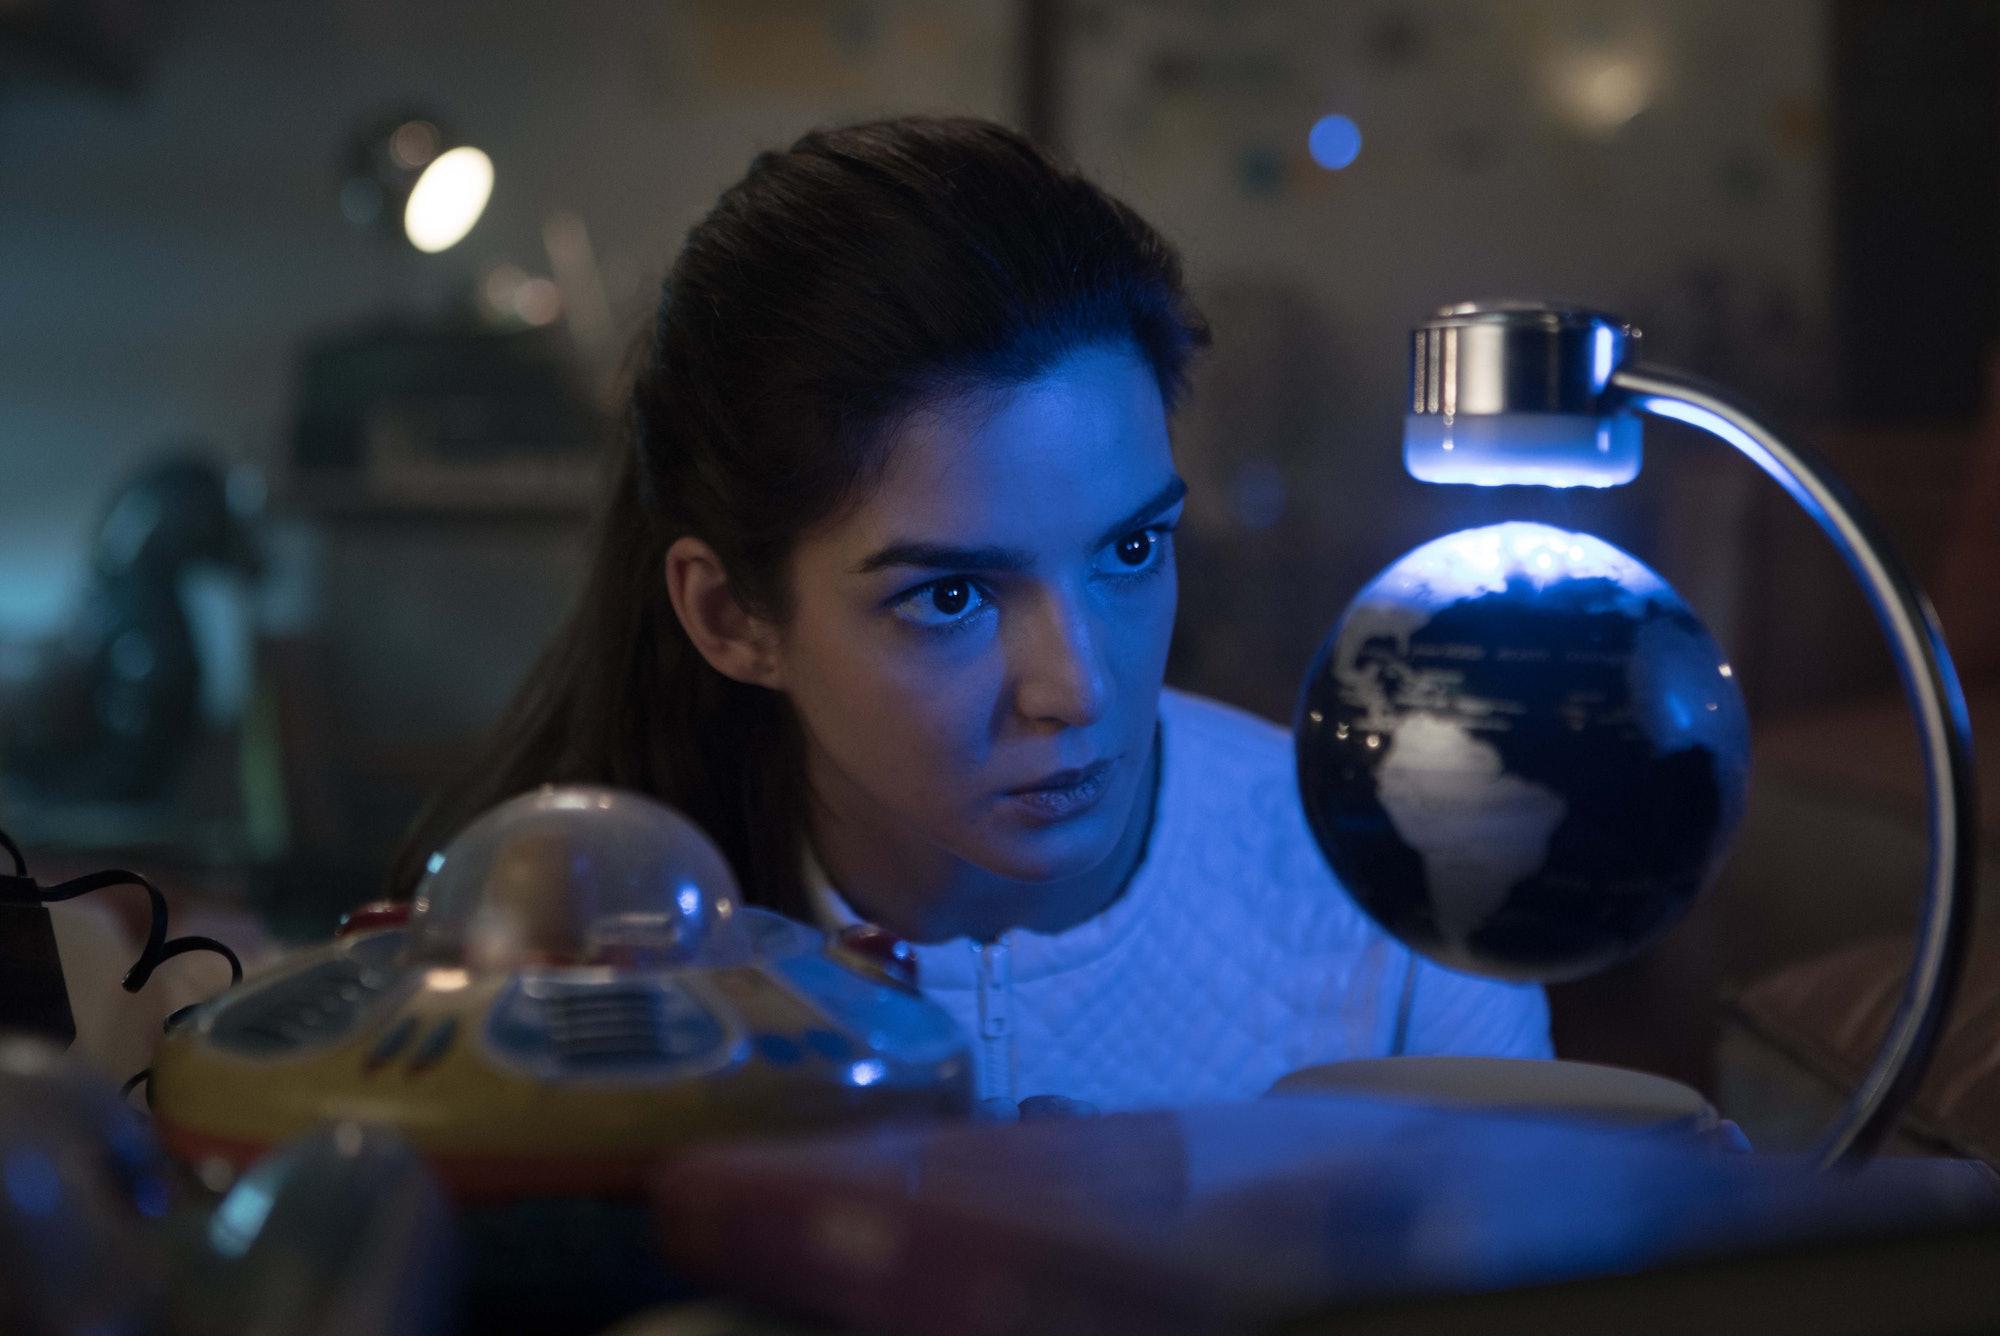 'Orbiter 9' seems like Netflix's answer to 'Moon' and 'Passengers'.